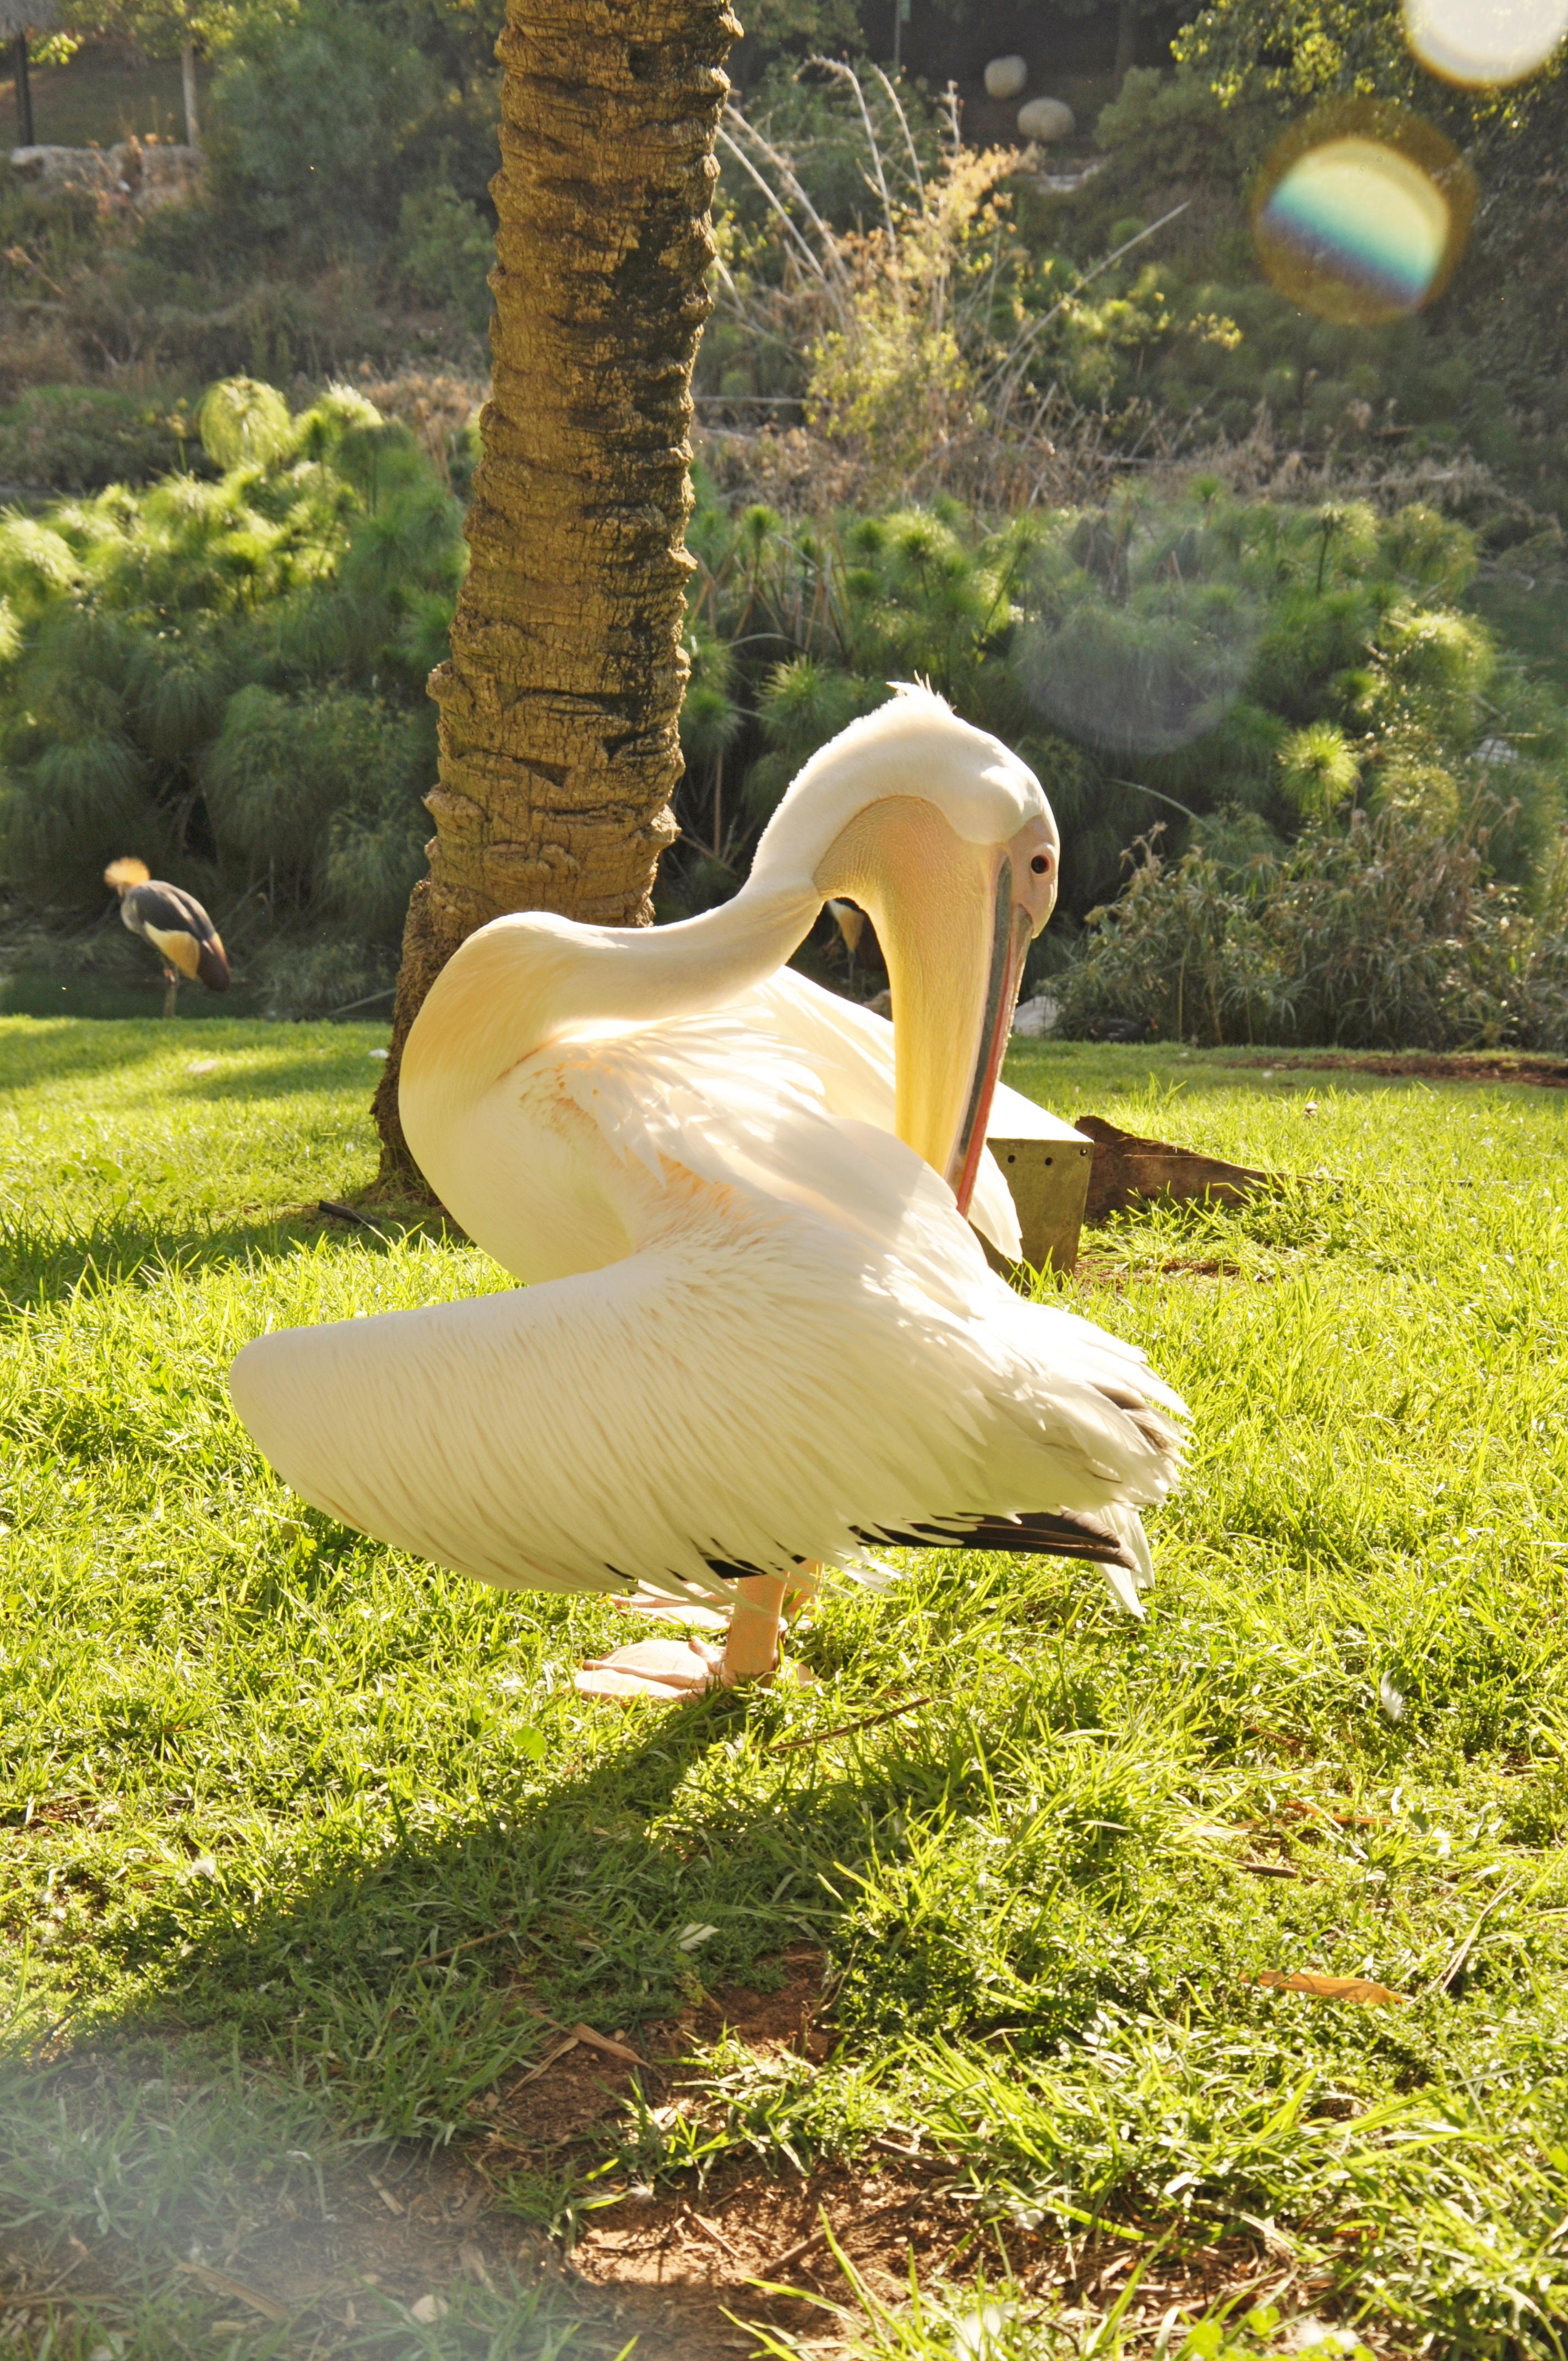 tree nature grass bird wing white lawn leaf flower animal pelican wildlife statue zoo green beak